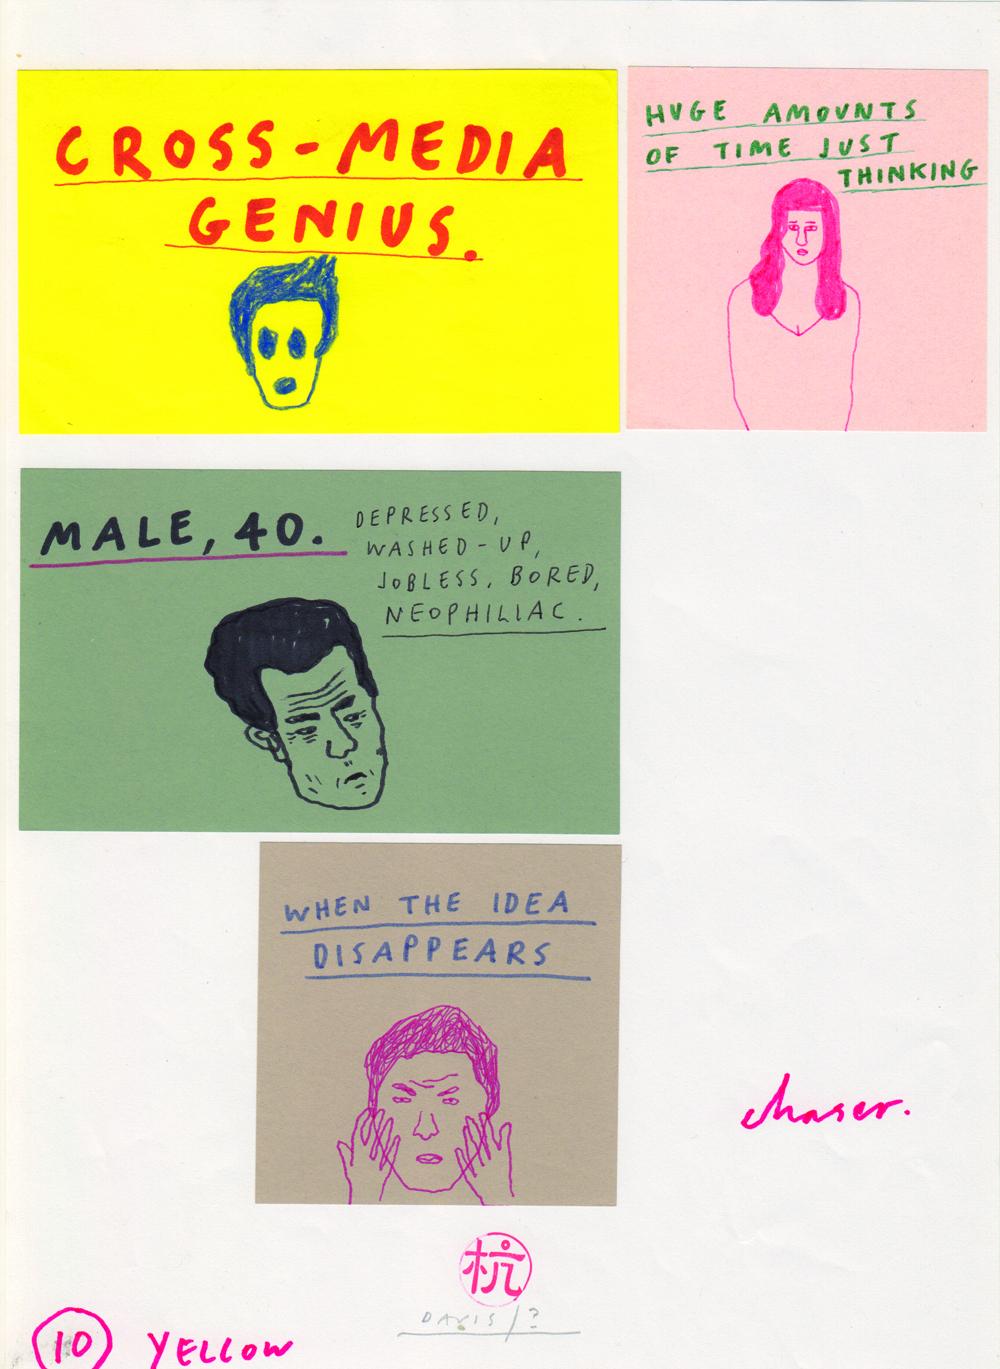 Paul Davis Post-it series